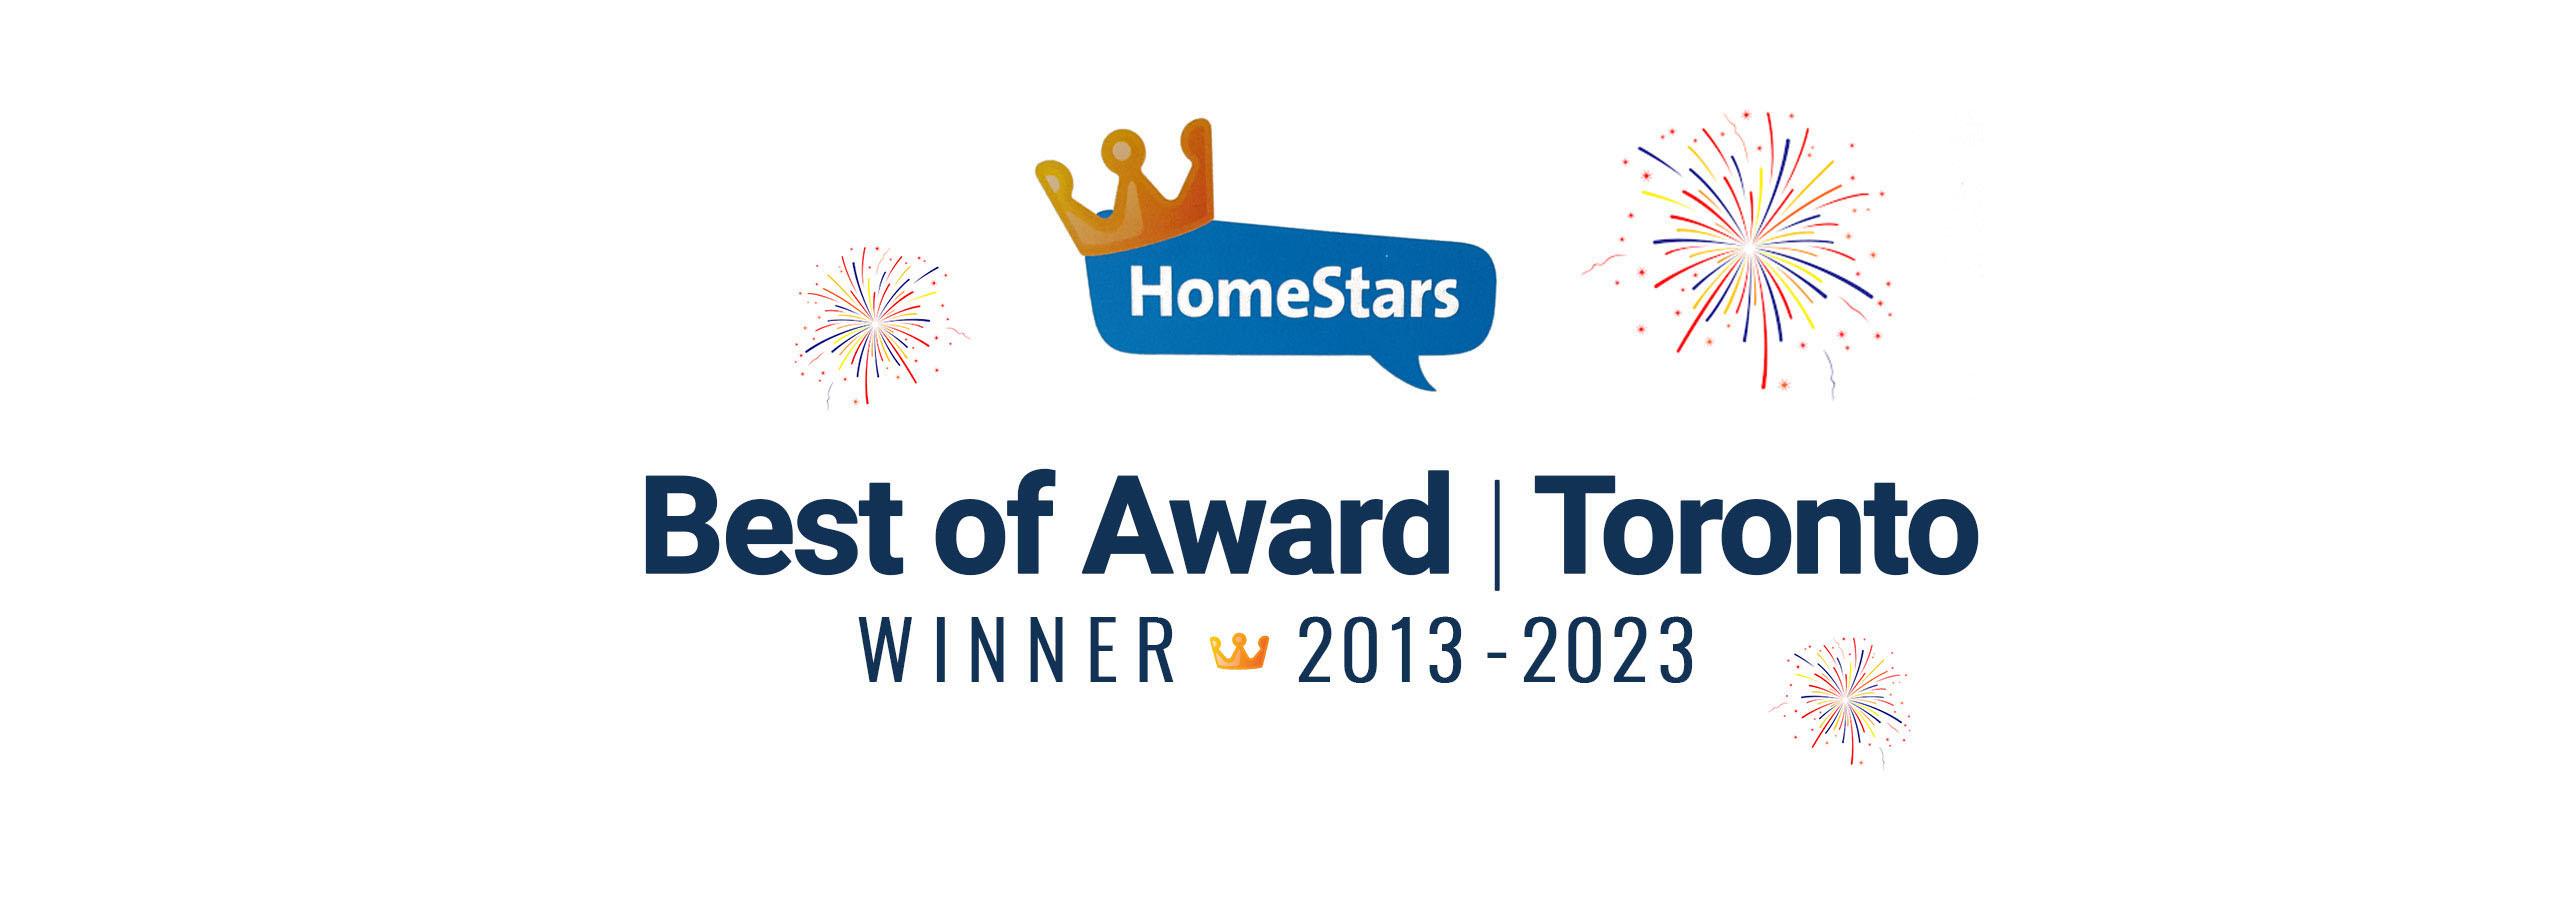 homestars-2013-2019-toronto